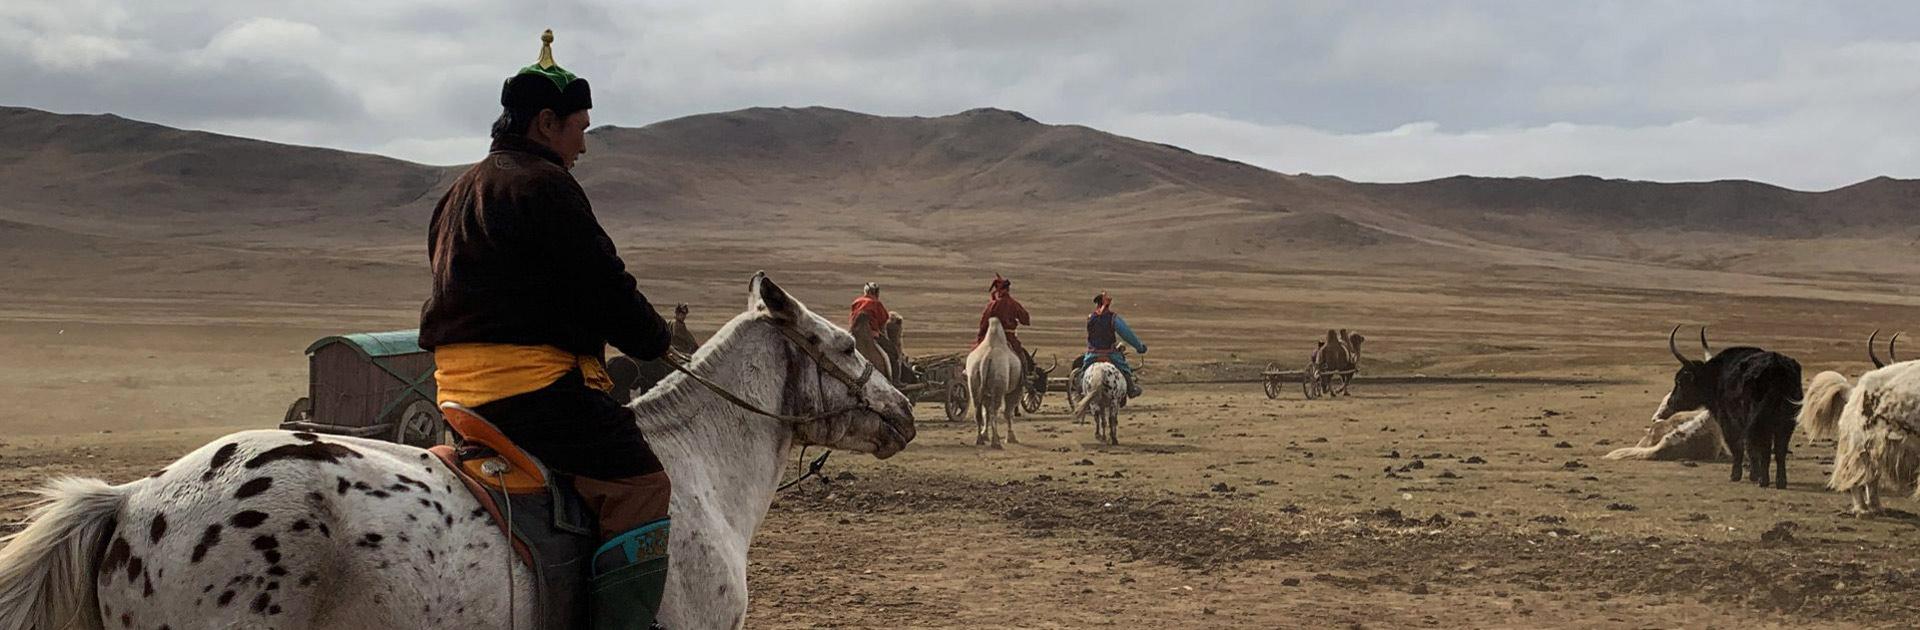 MN Mongolia Explorar la Tierra Misteriosa 14 días 2